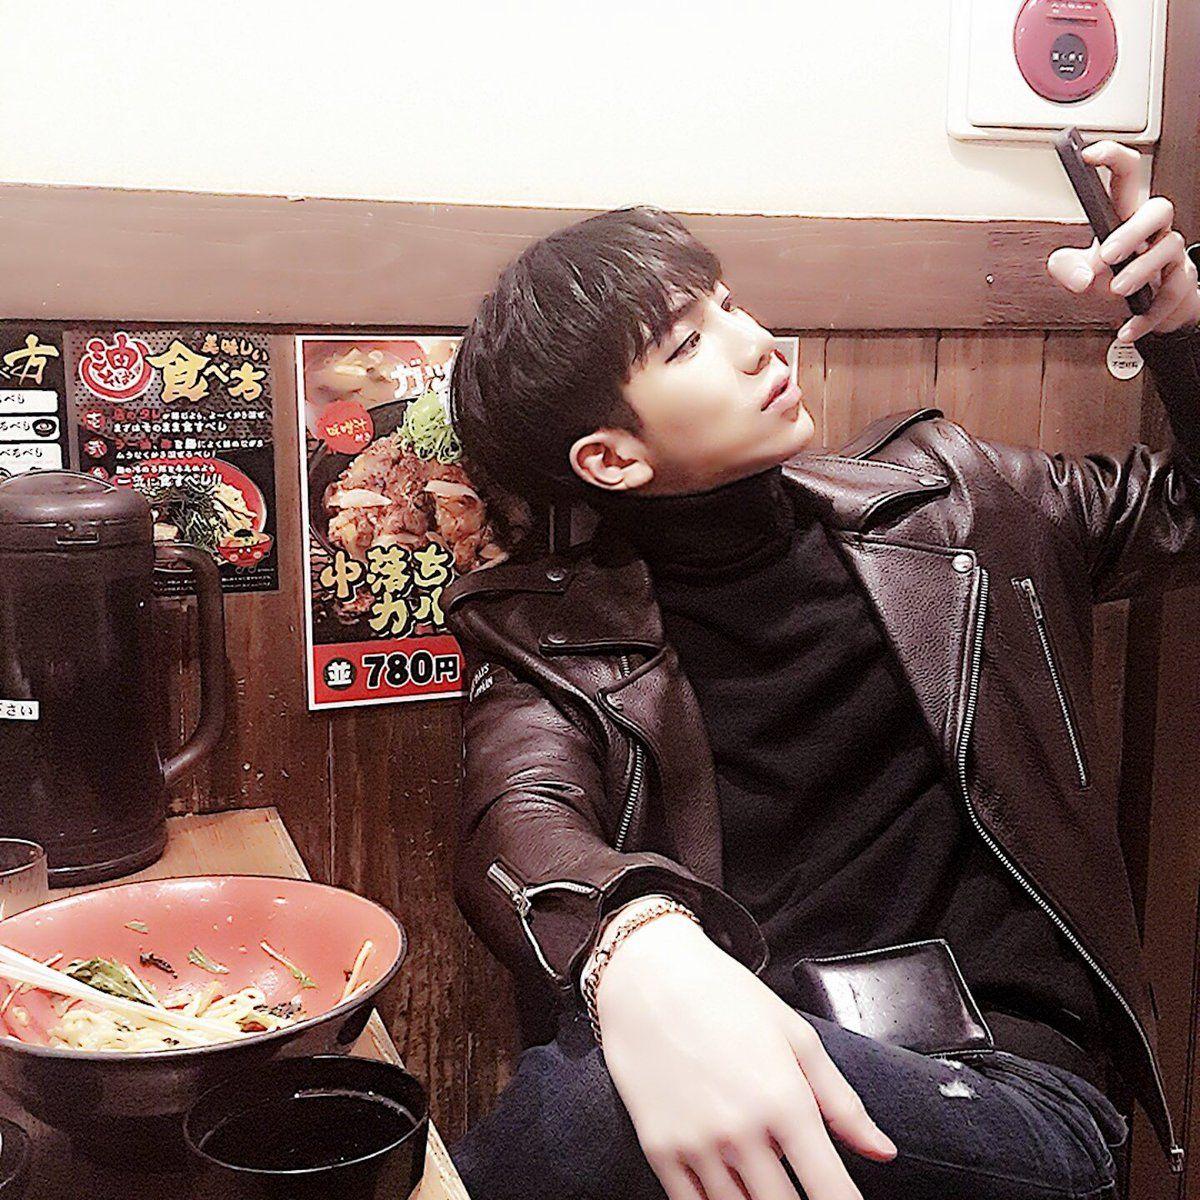 Korean baby boy hairstyle pin by everyone hates you on bonkuk  gu bon kuk inx  pinterest